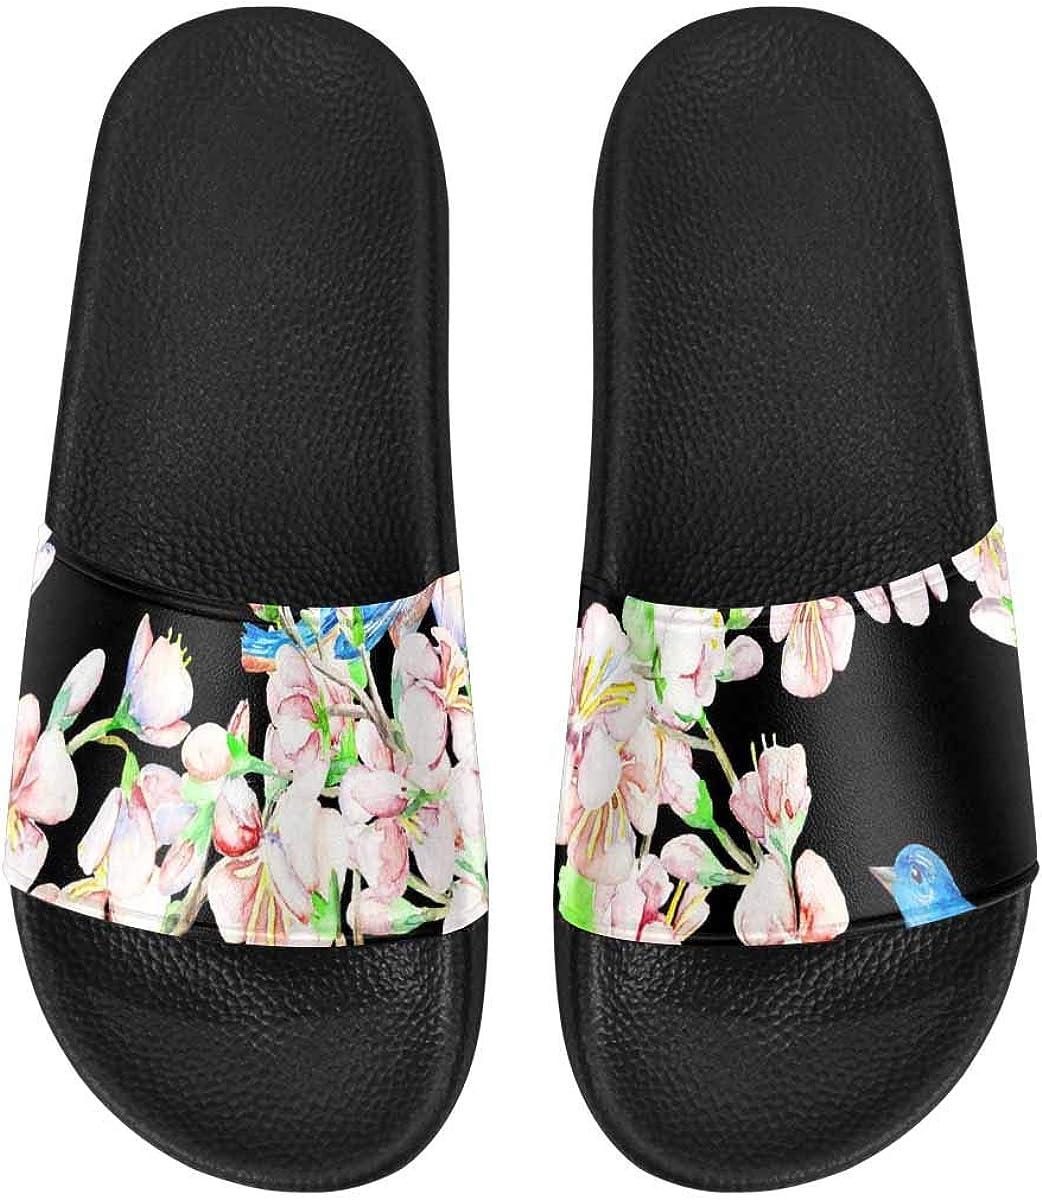 InterestPrint Women's Lightweight Slipper Sandals for Shower Cheery Flower